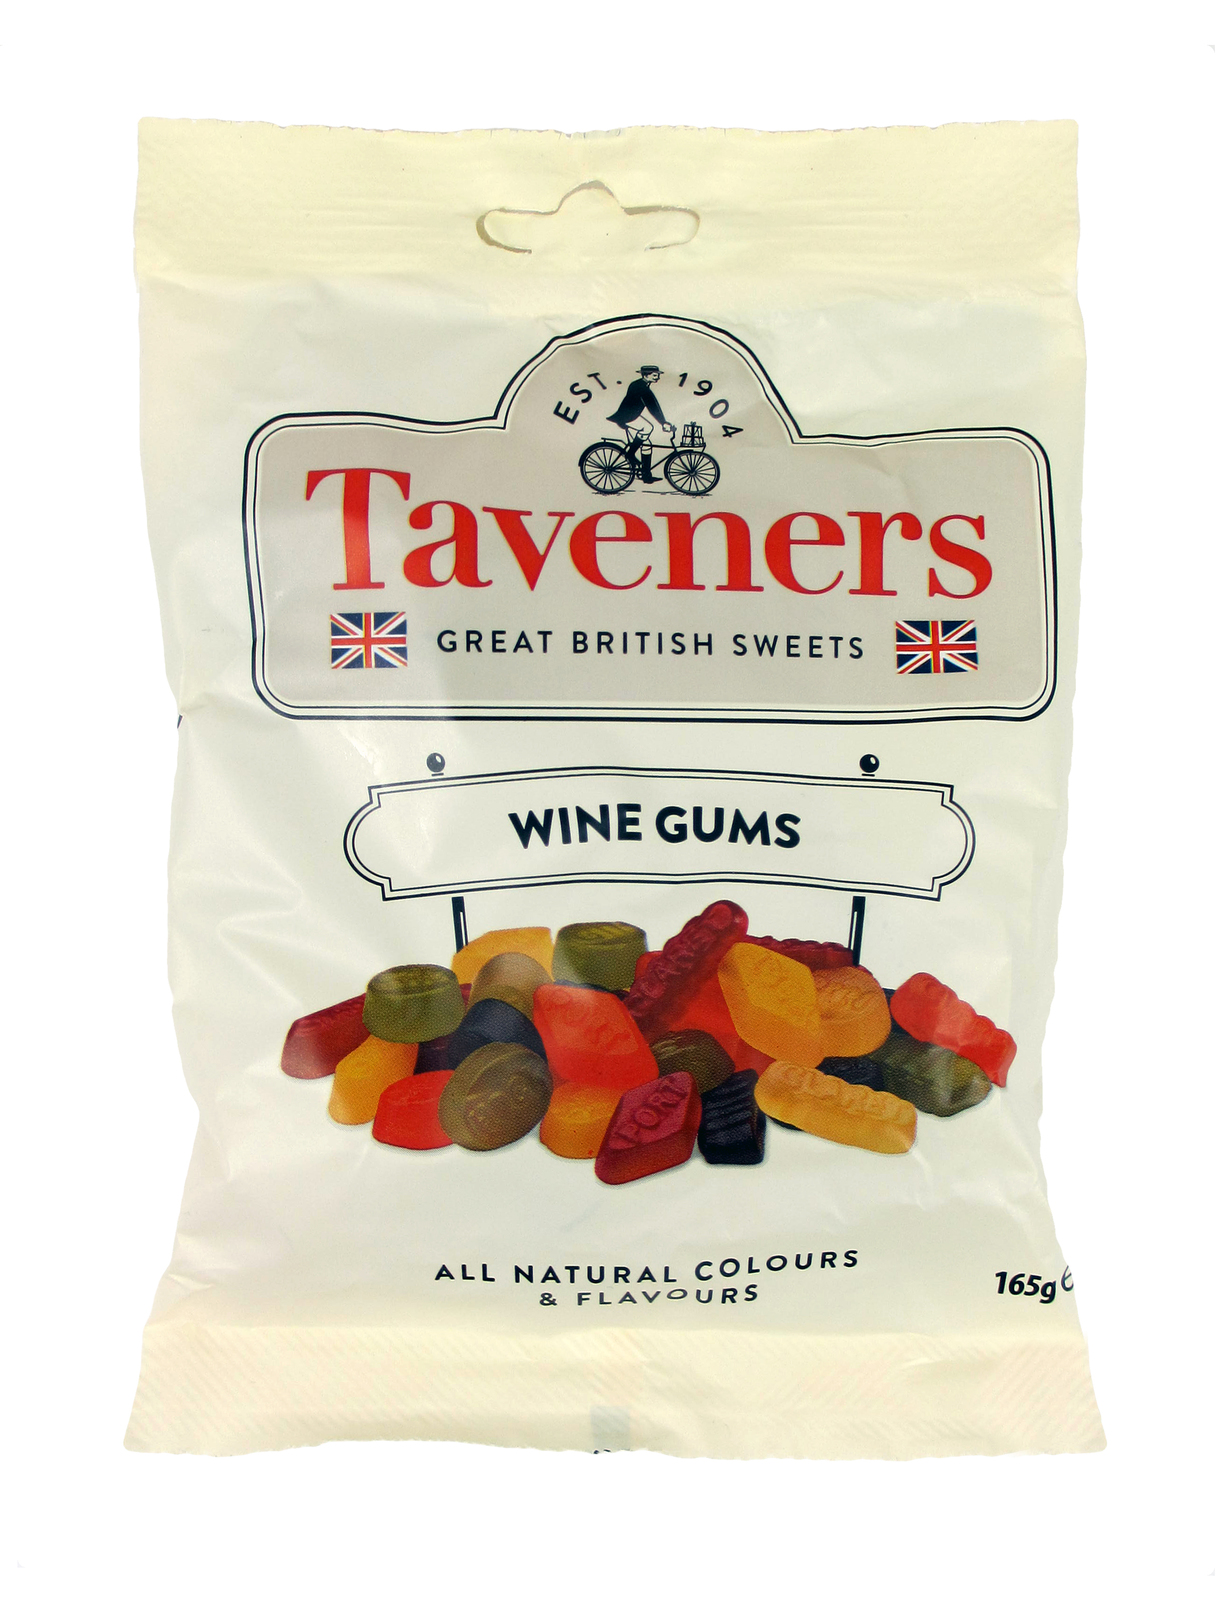 Taveners Wine Gums (165g) image